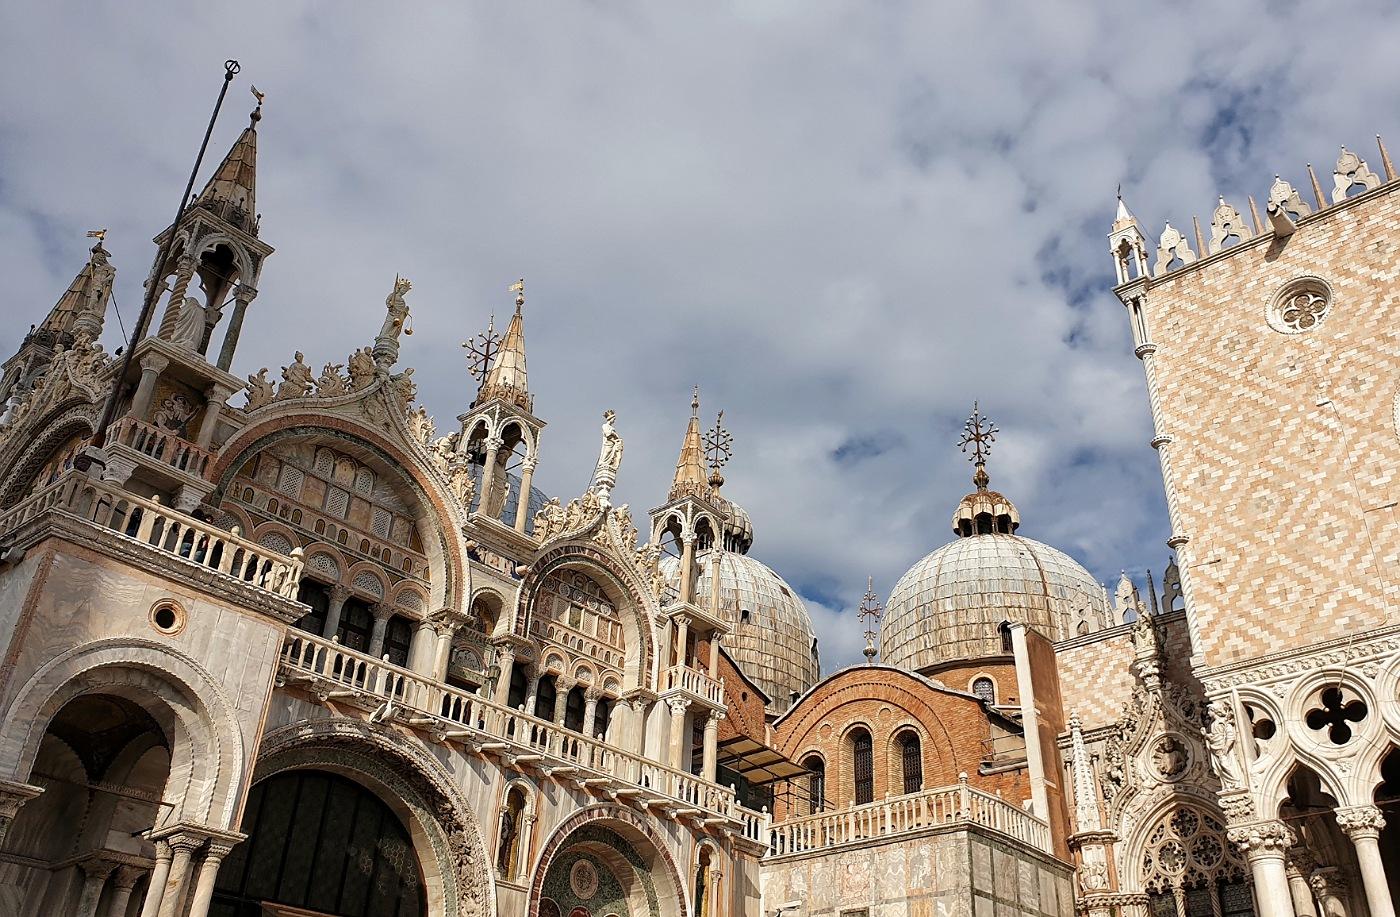 venezia città d'arte bonus vacanze